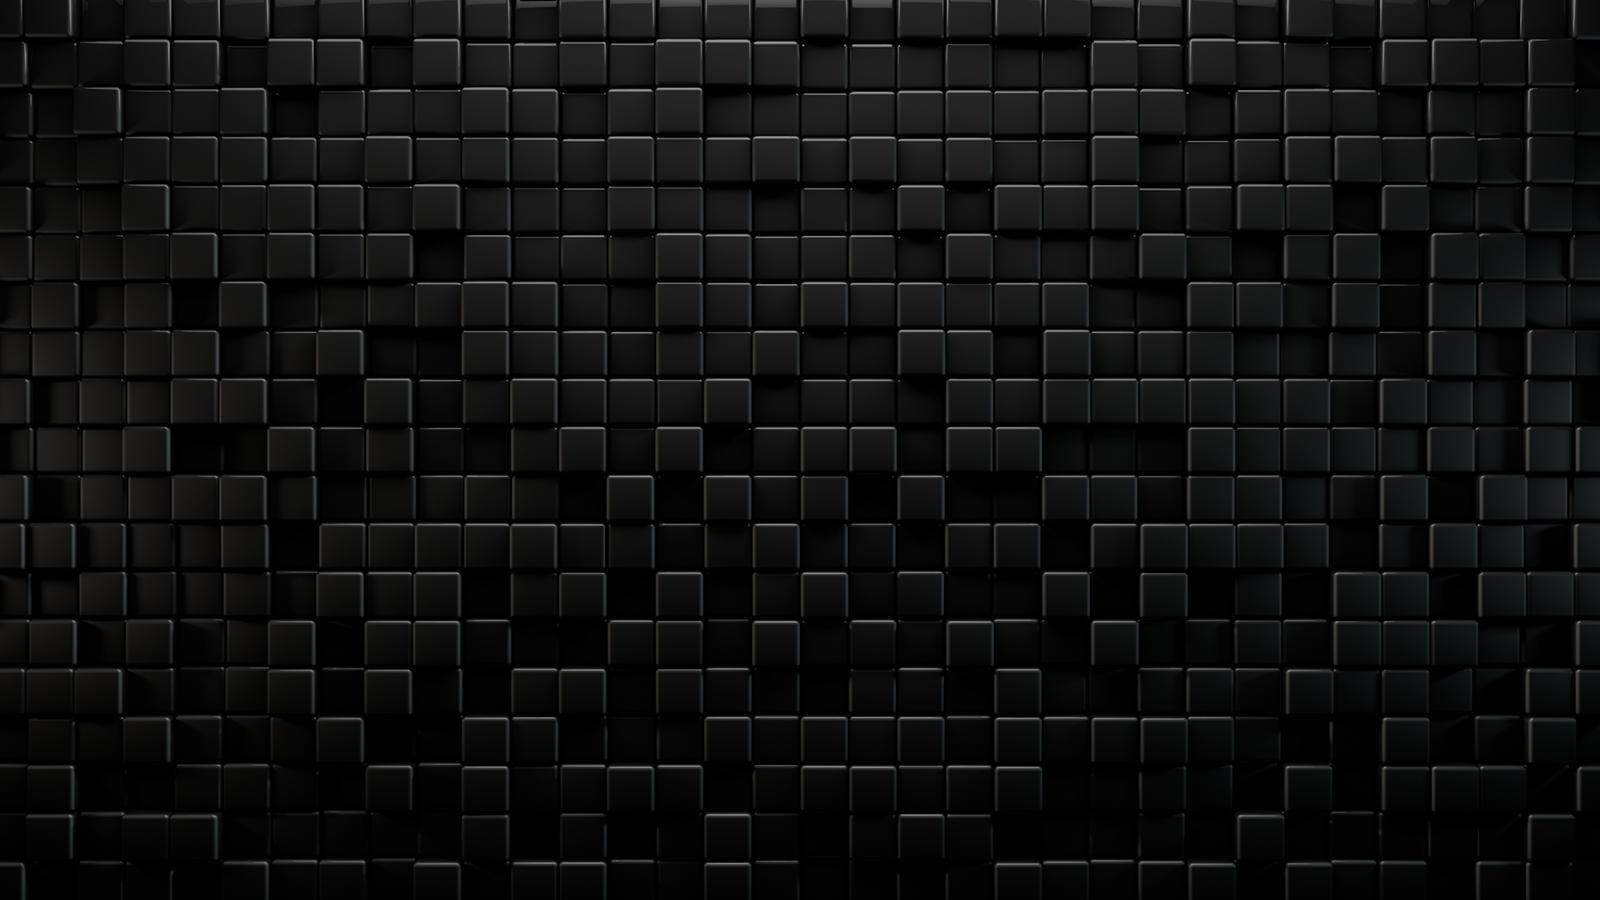 Cinema 4d cube plane wallpaper by necrobyte1 on deviantart cinema 4d cube plane wallpaper by necrobyte1 voltagebd Choice Image